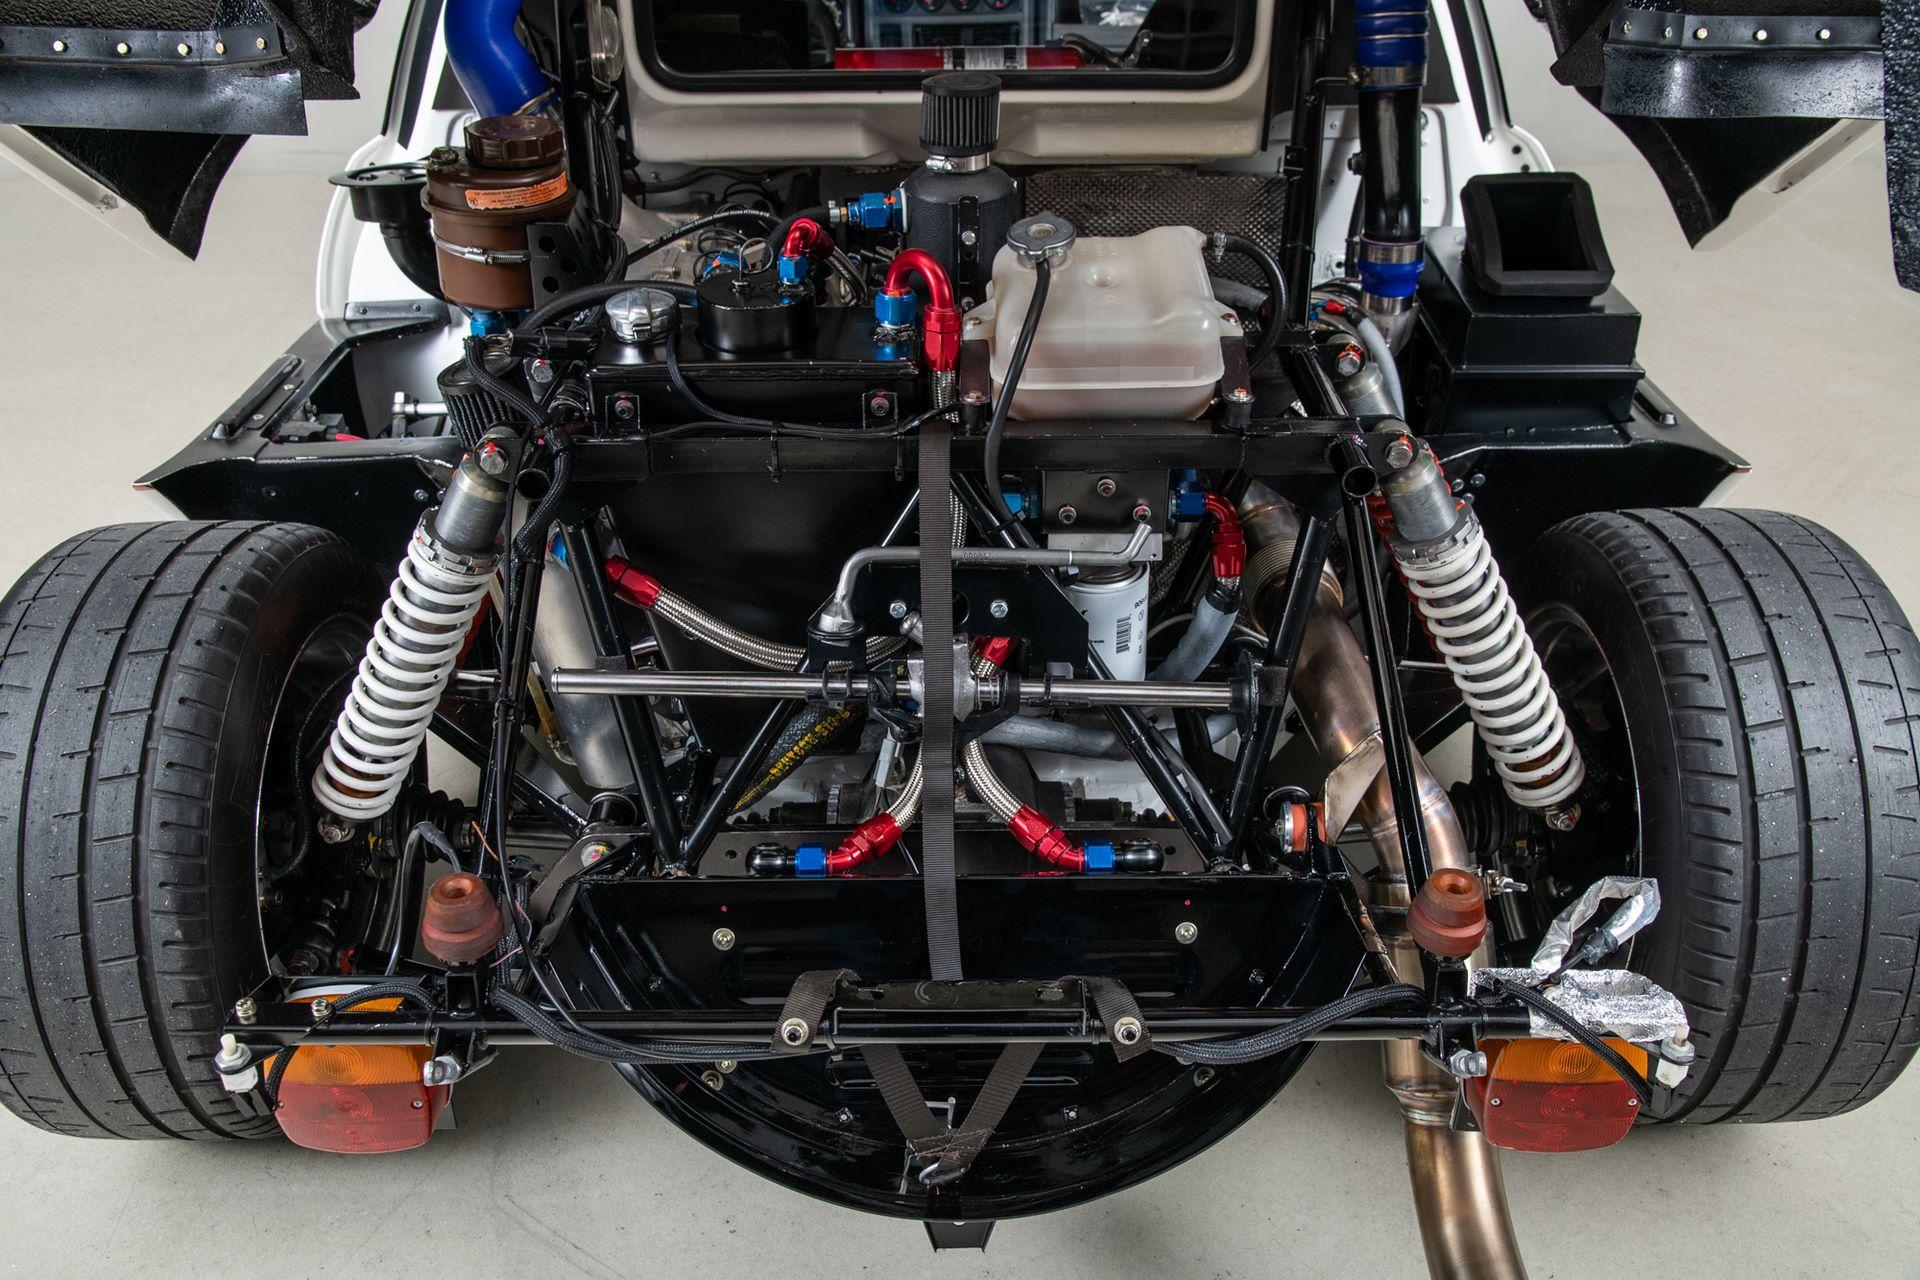 Ford-RS200-Evolution-Evo-for-sale-25